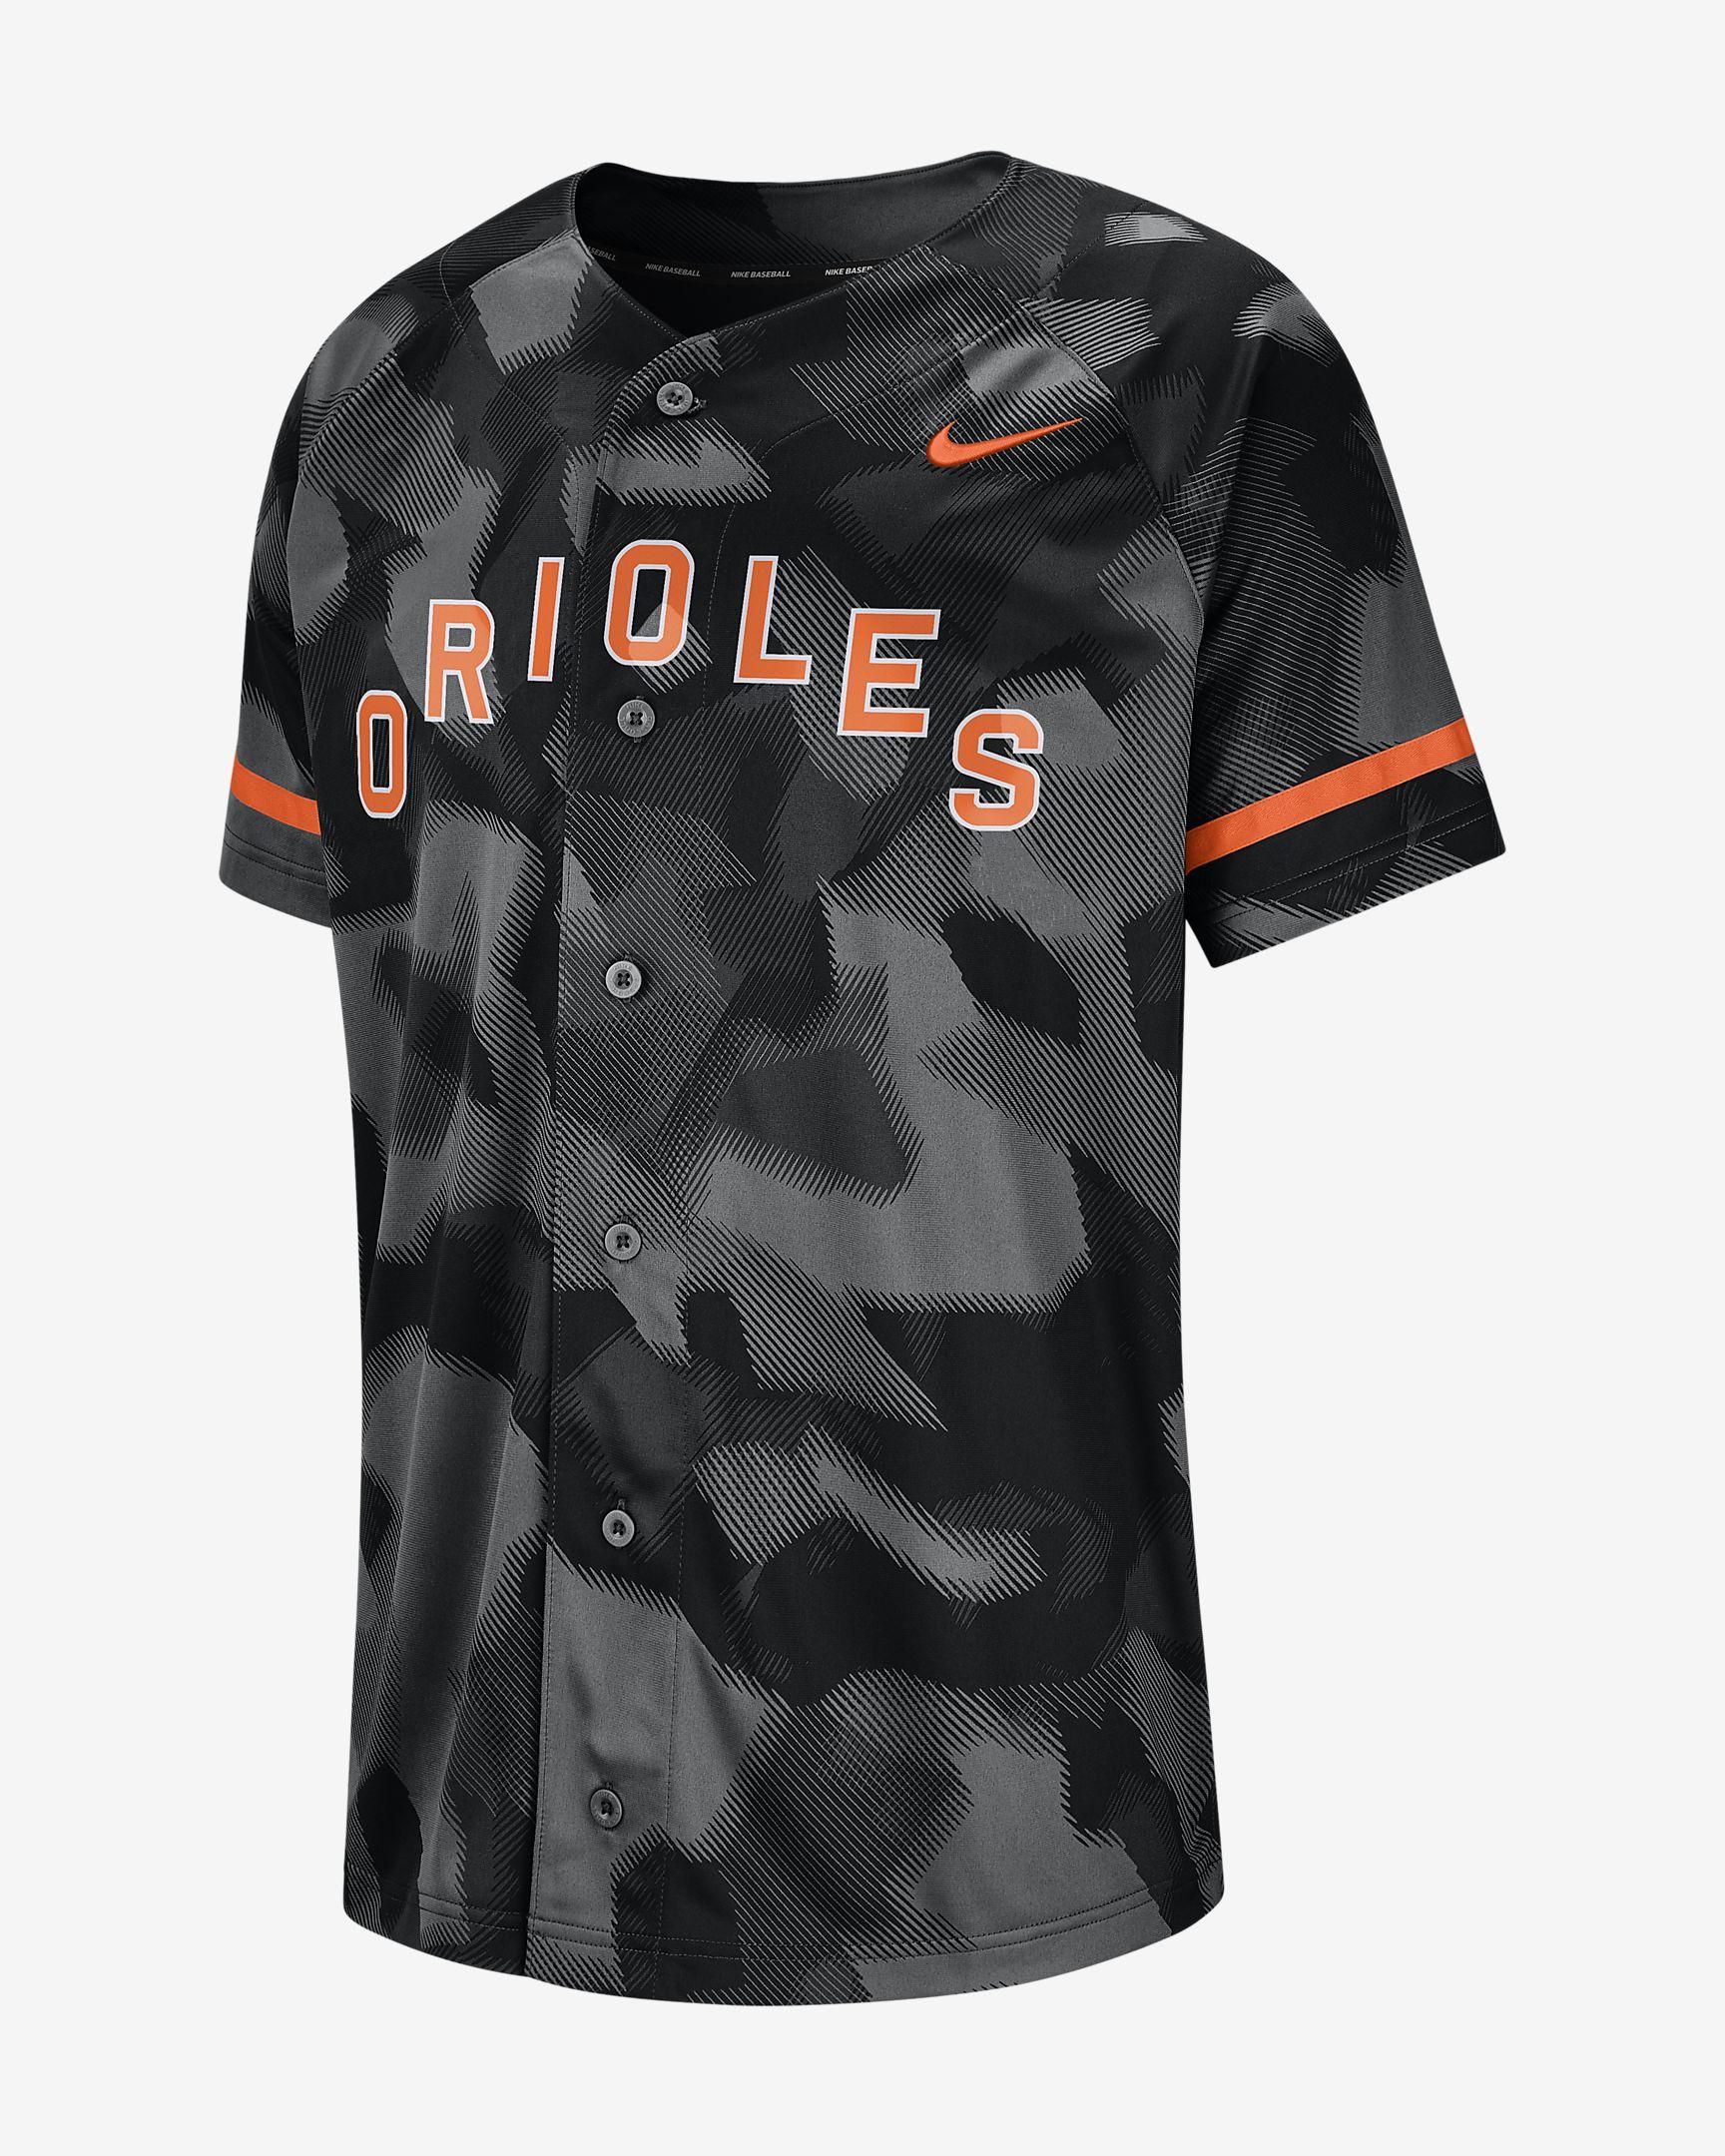 dri-fit-orioles-mens-baseball-jersey-3Ct